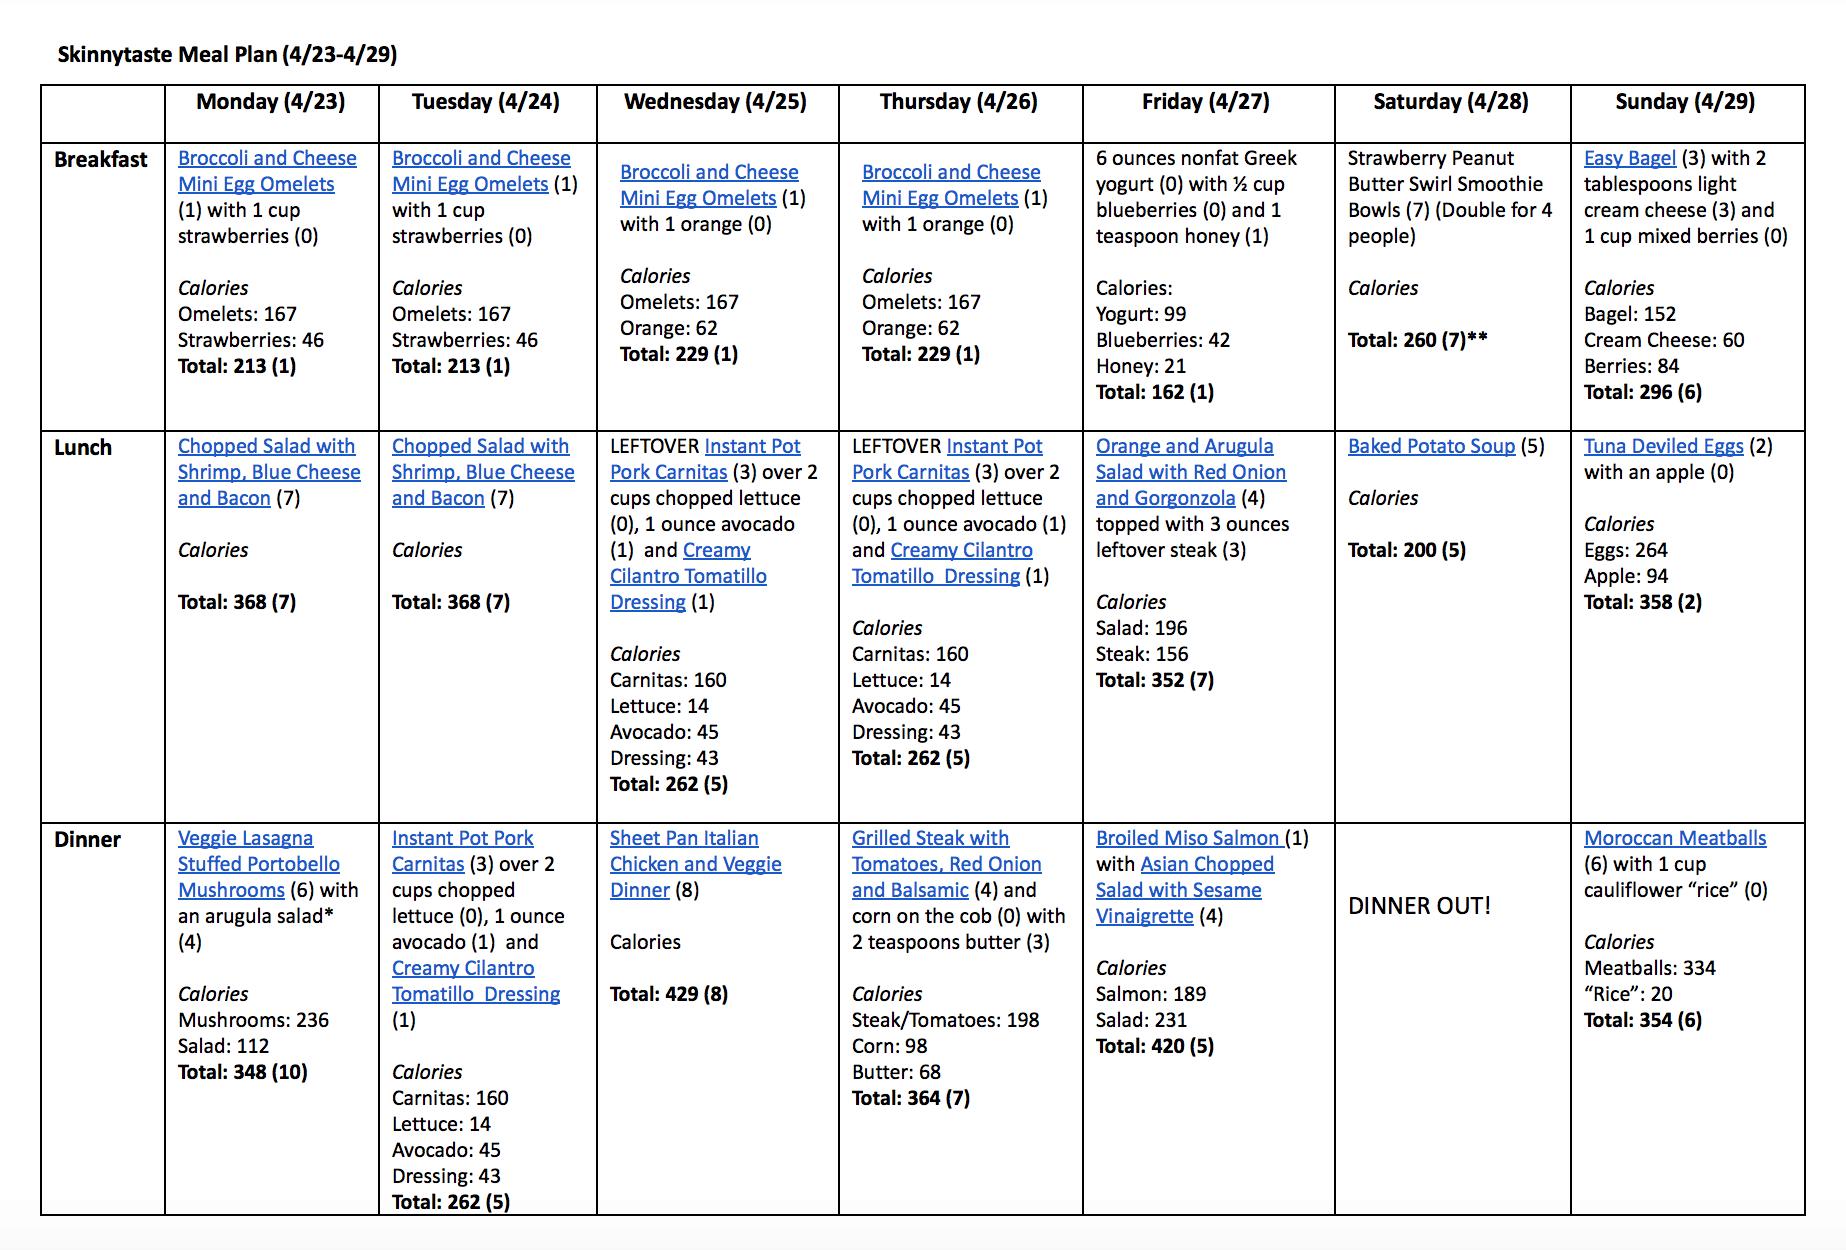 Skinnytaste Meal Plan (April 23-April 29)